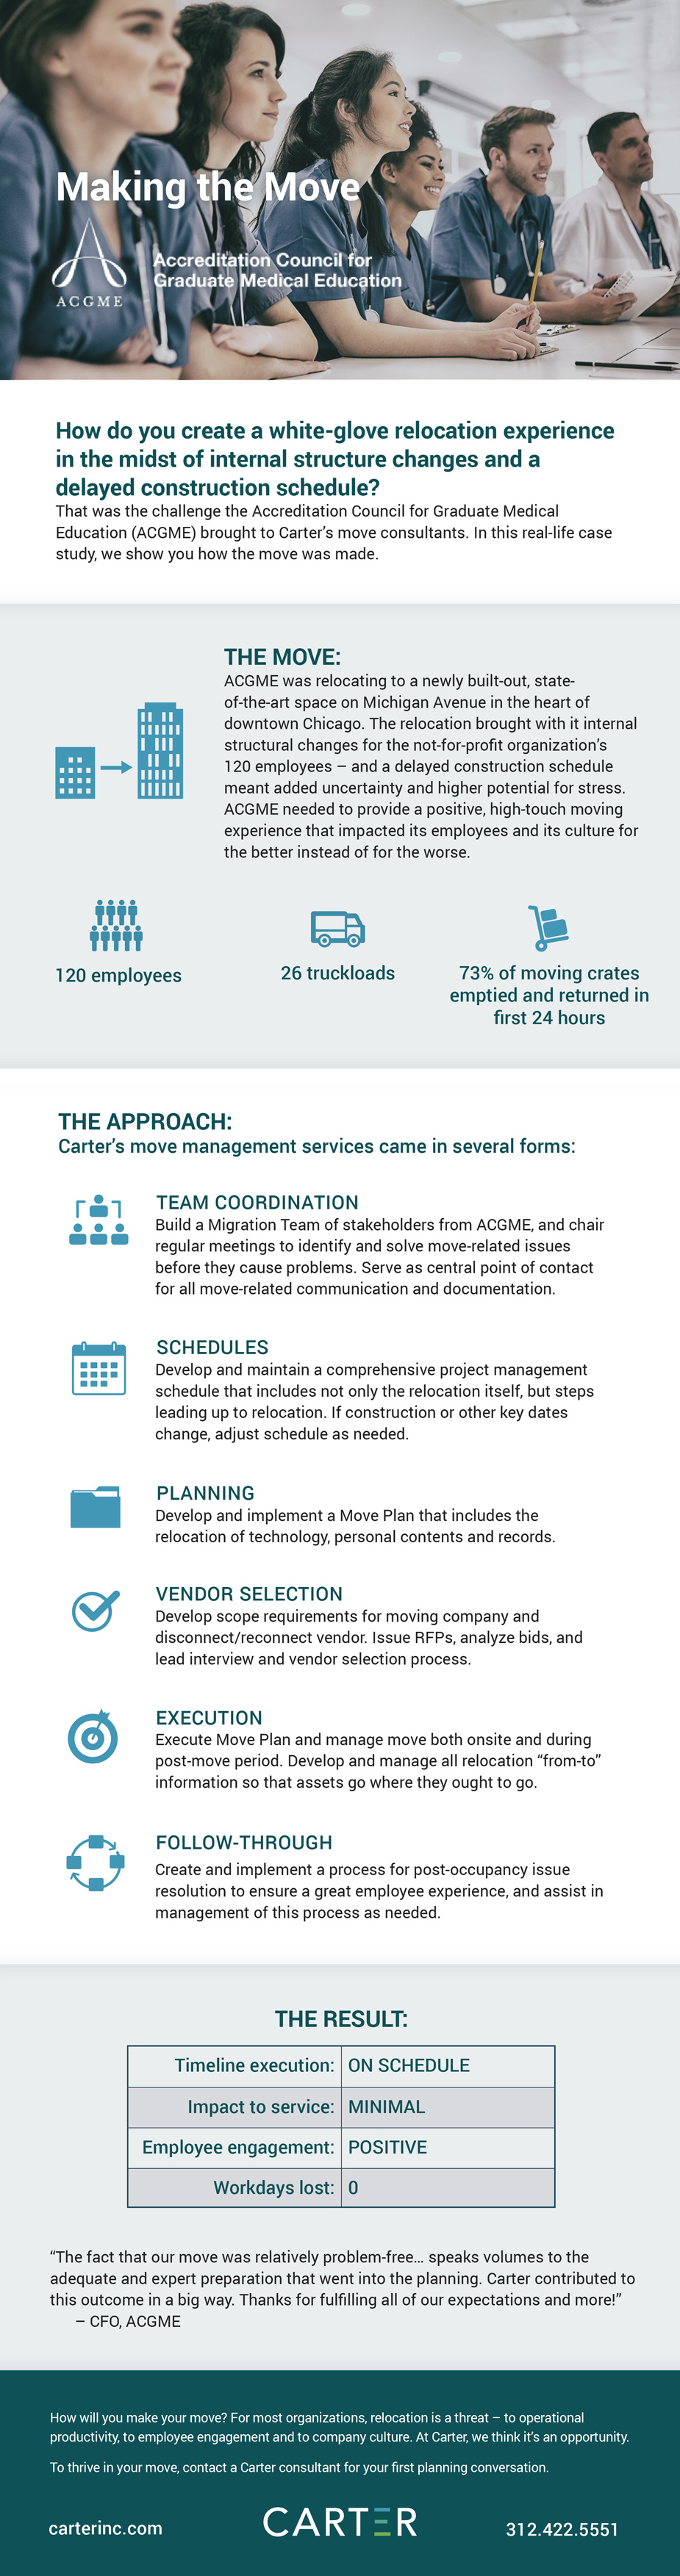 carterinc-acgme-infographic